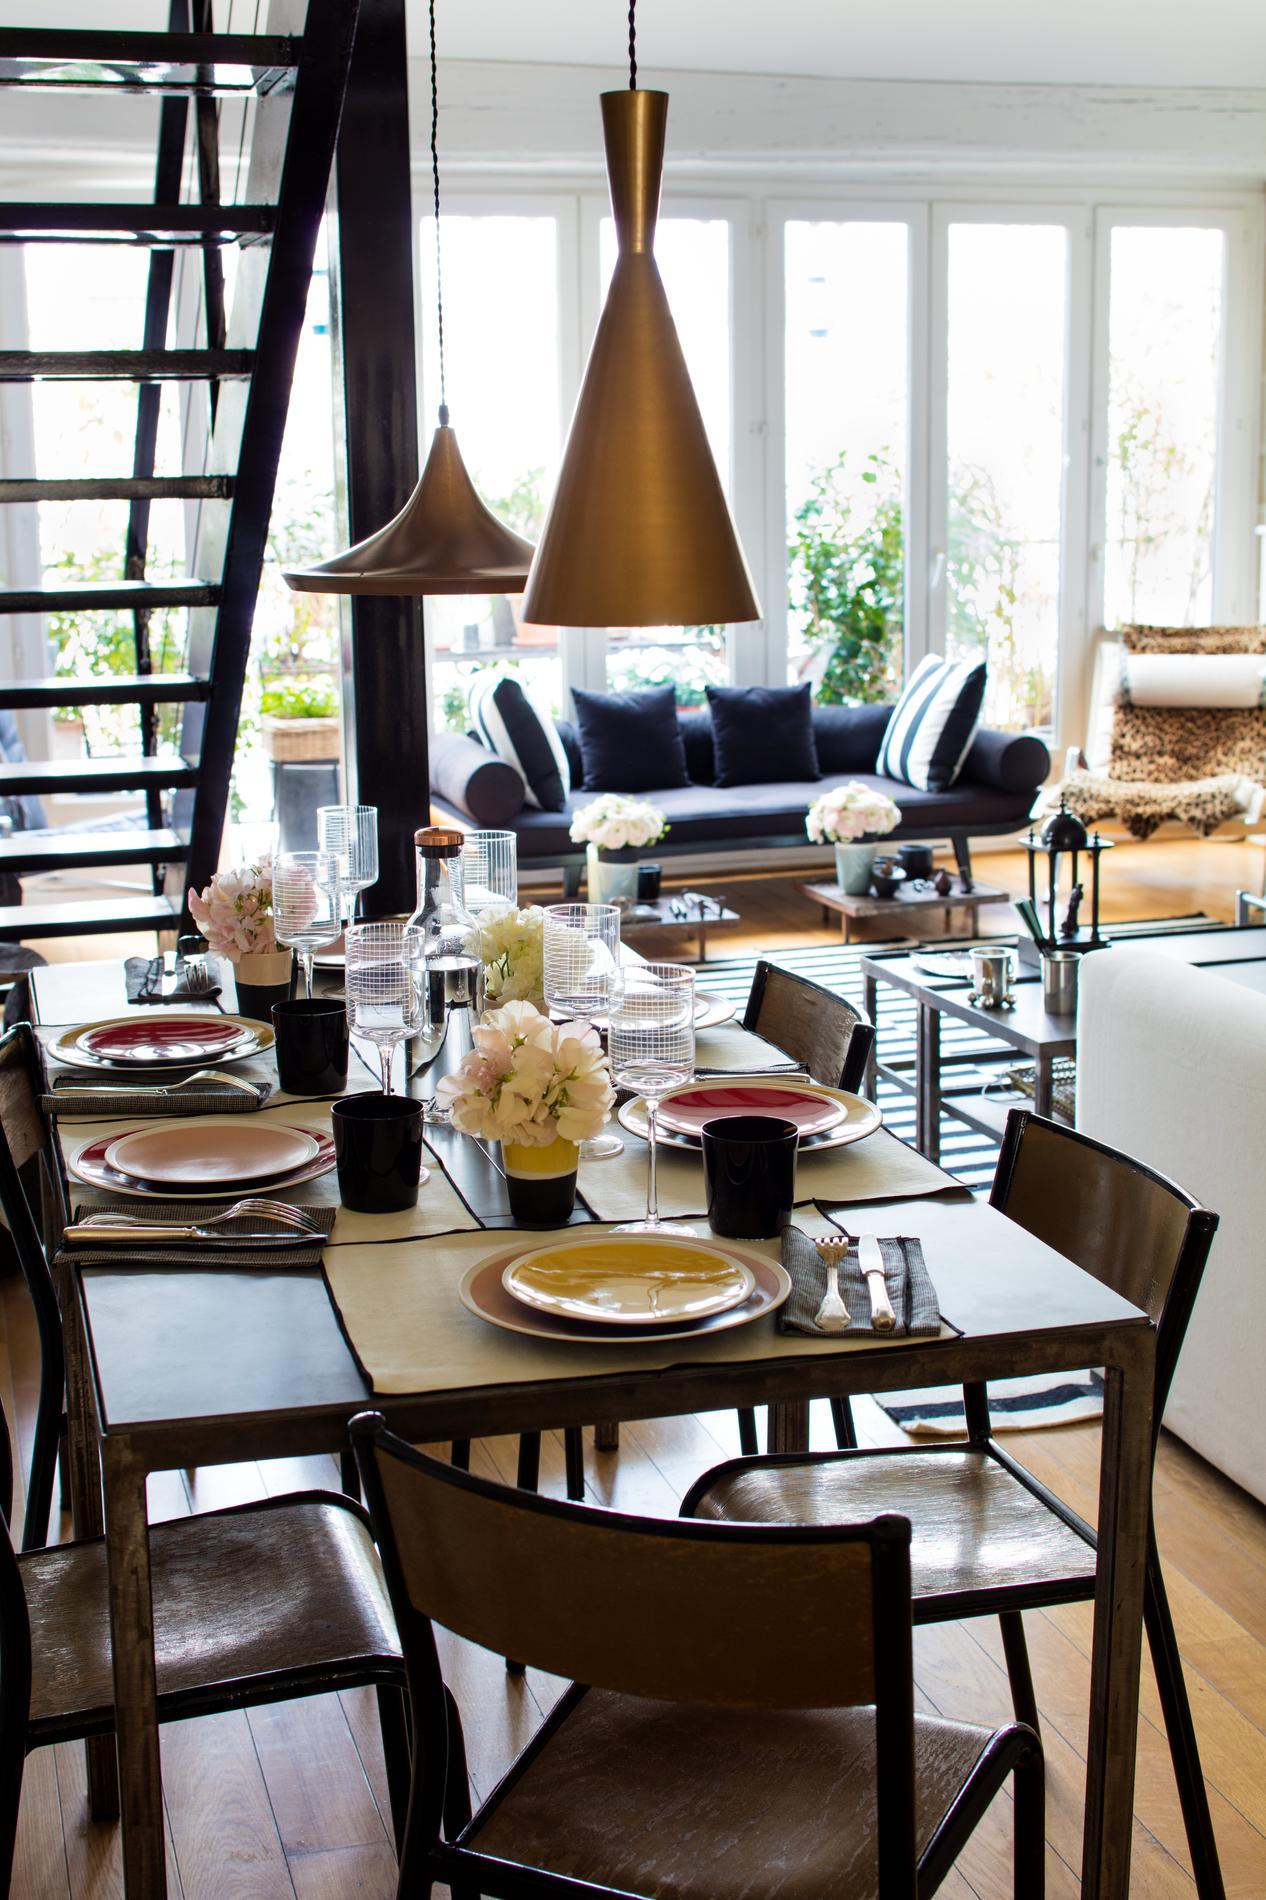 sarah lavoine maison de campagne avie home. Black Bedroom Furniture Sets. Home Design Ideas